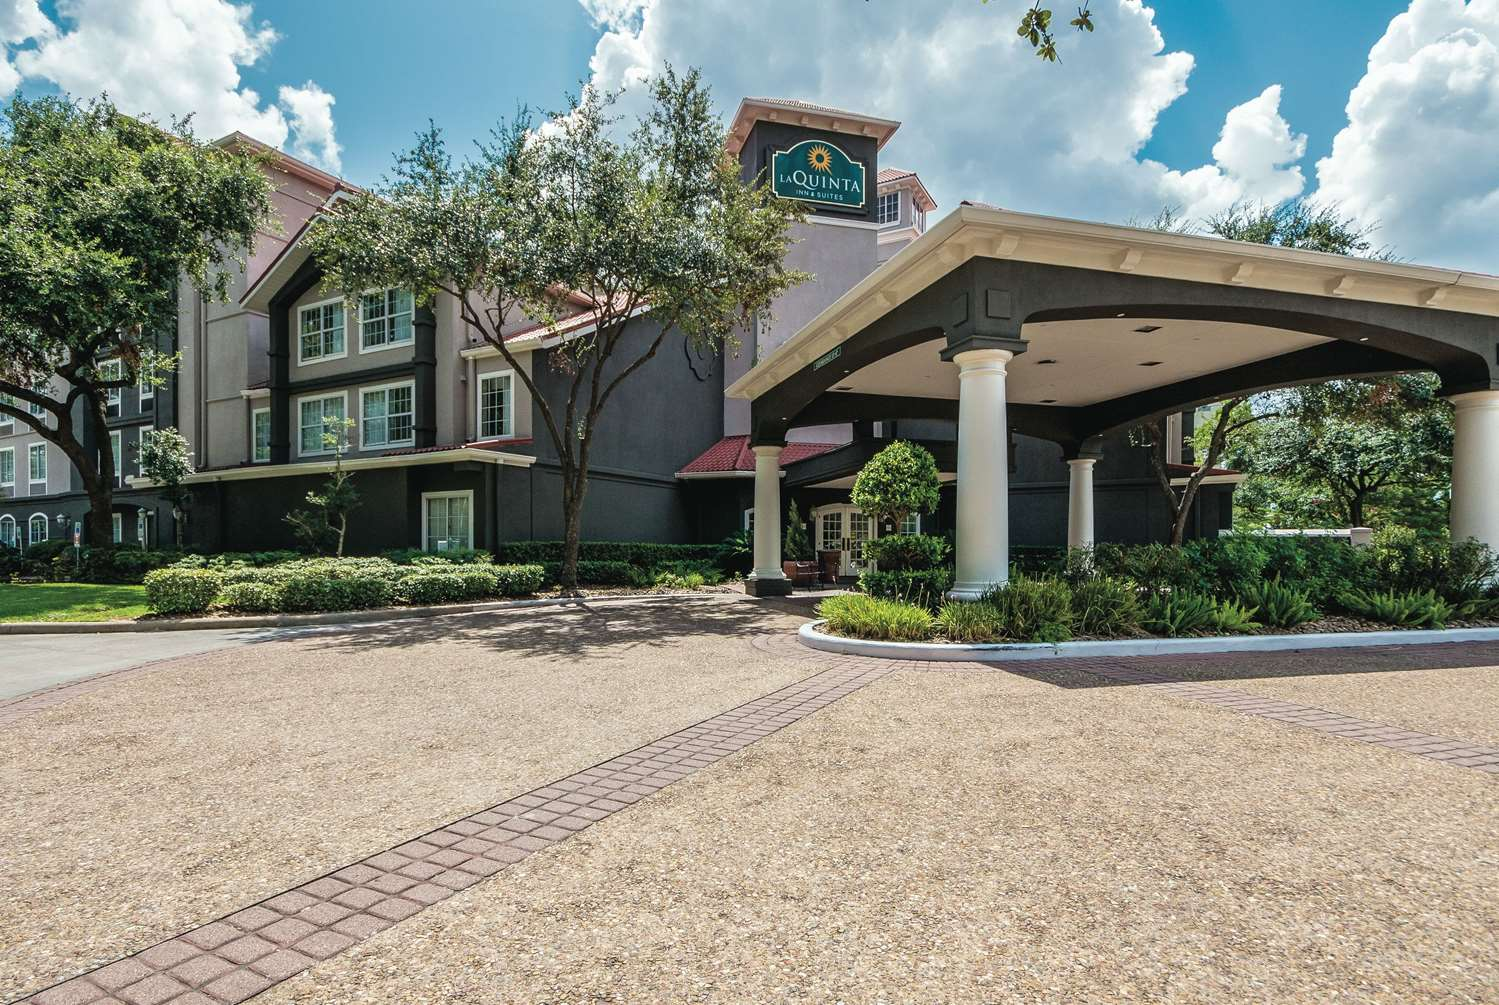 La Quinta Inn Suites Bush Airport Houston Tx See Discounts